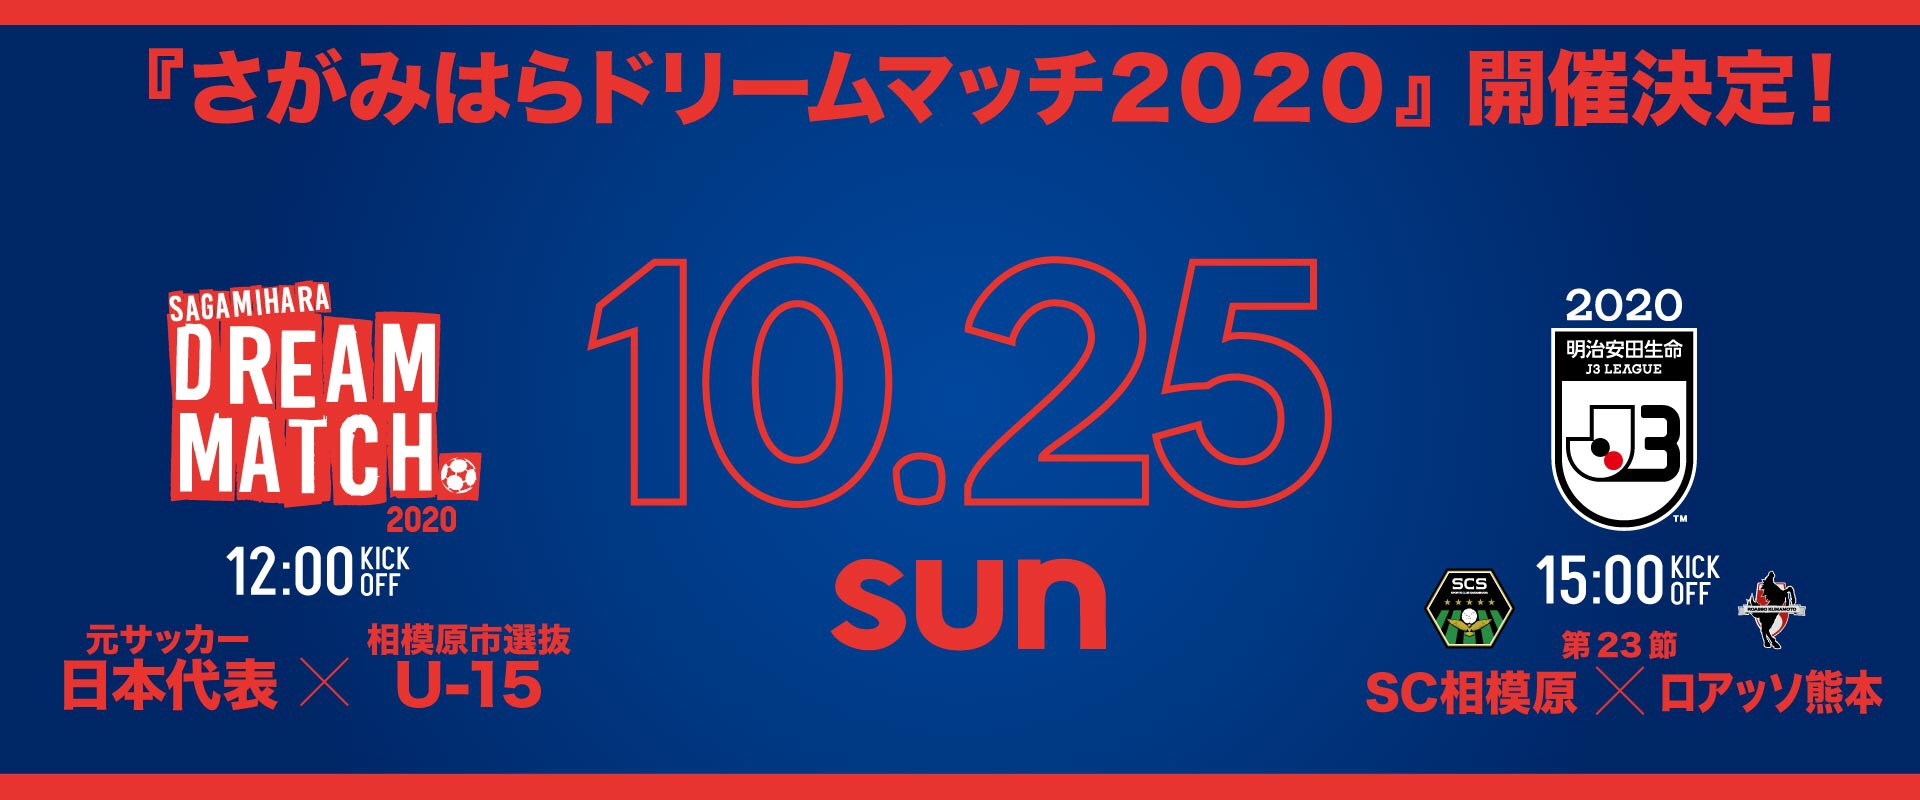 dreammatch2020.jpg